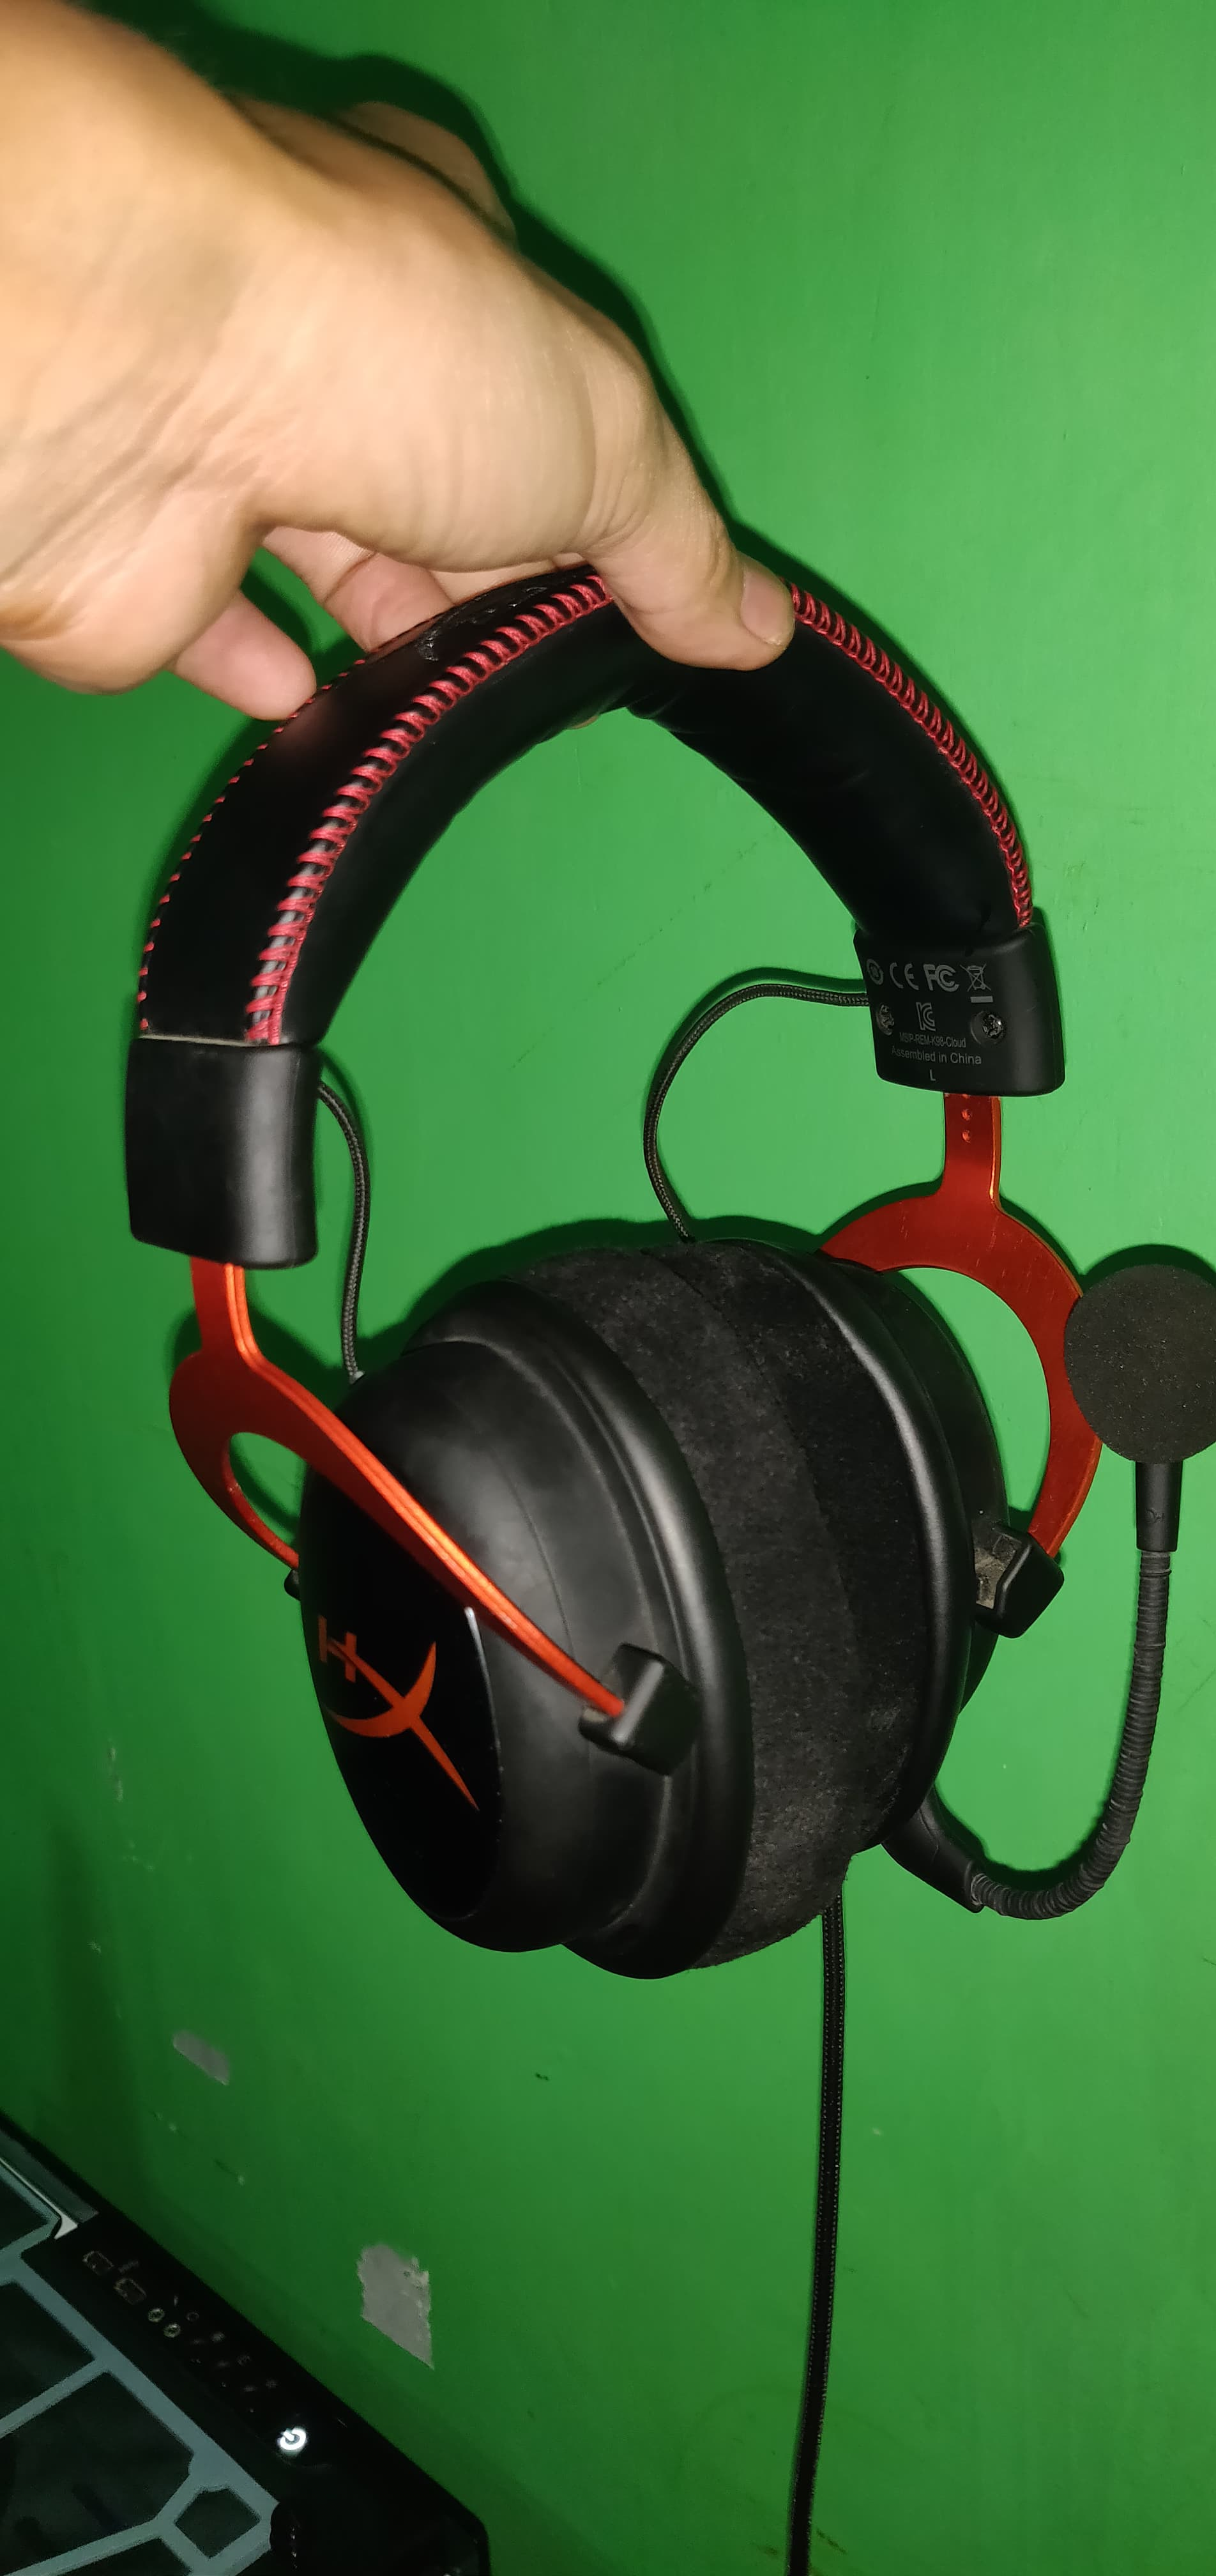 misodiko [Upgraded Large Comfy] Replacement Headphones Ear Pads Earpads  Cushions Kit -Brainwavz HM5/ ATH M50x MSR7 M40x M30x M70x/ HD280 Pro HD380